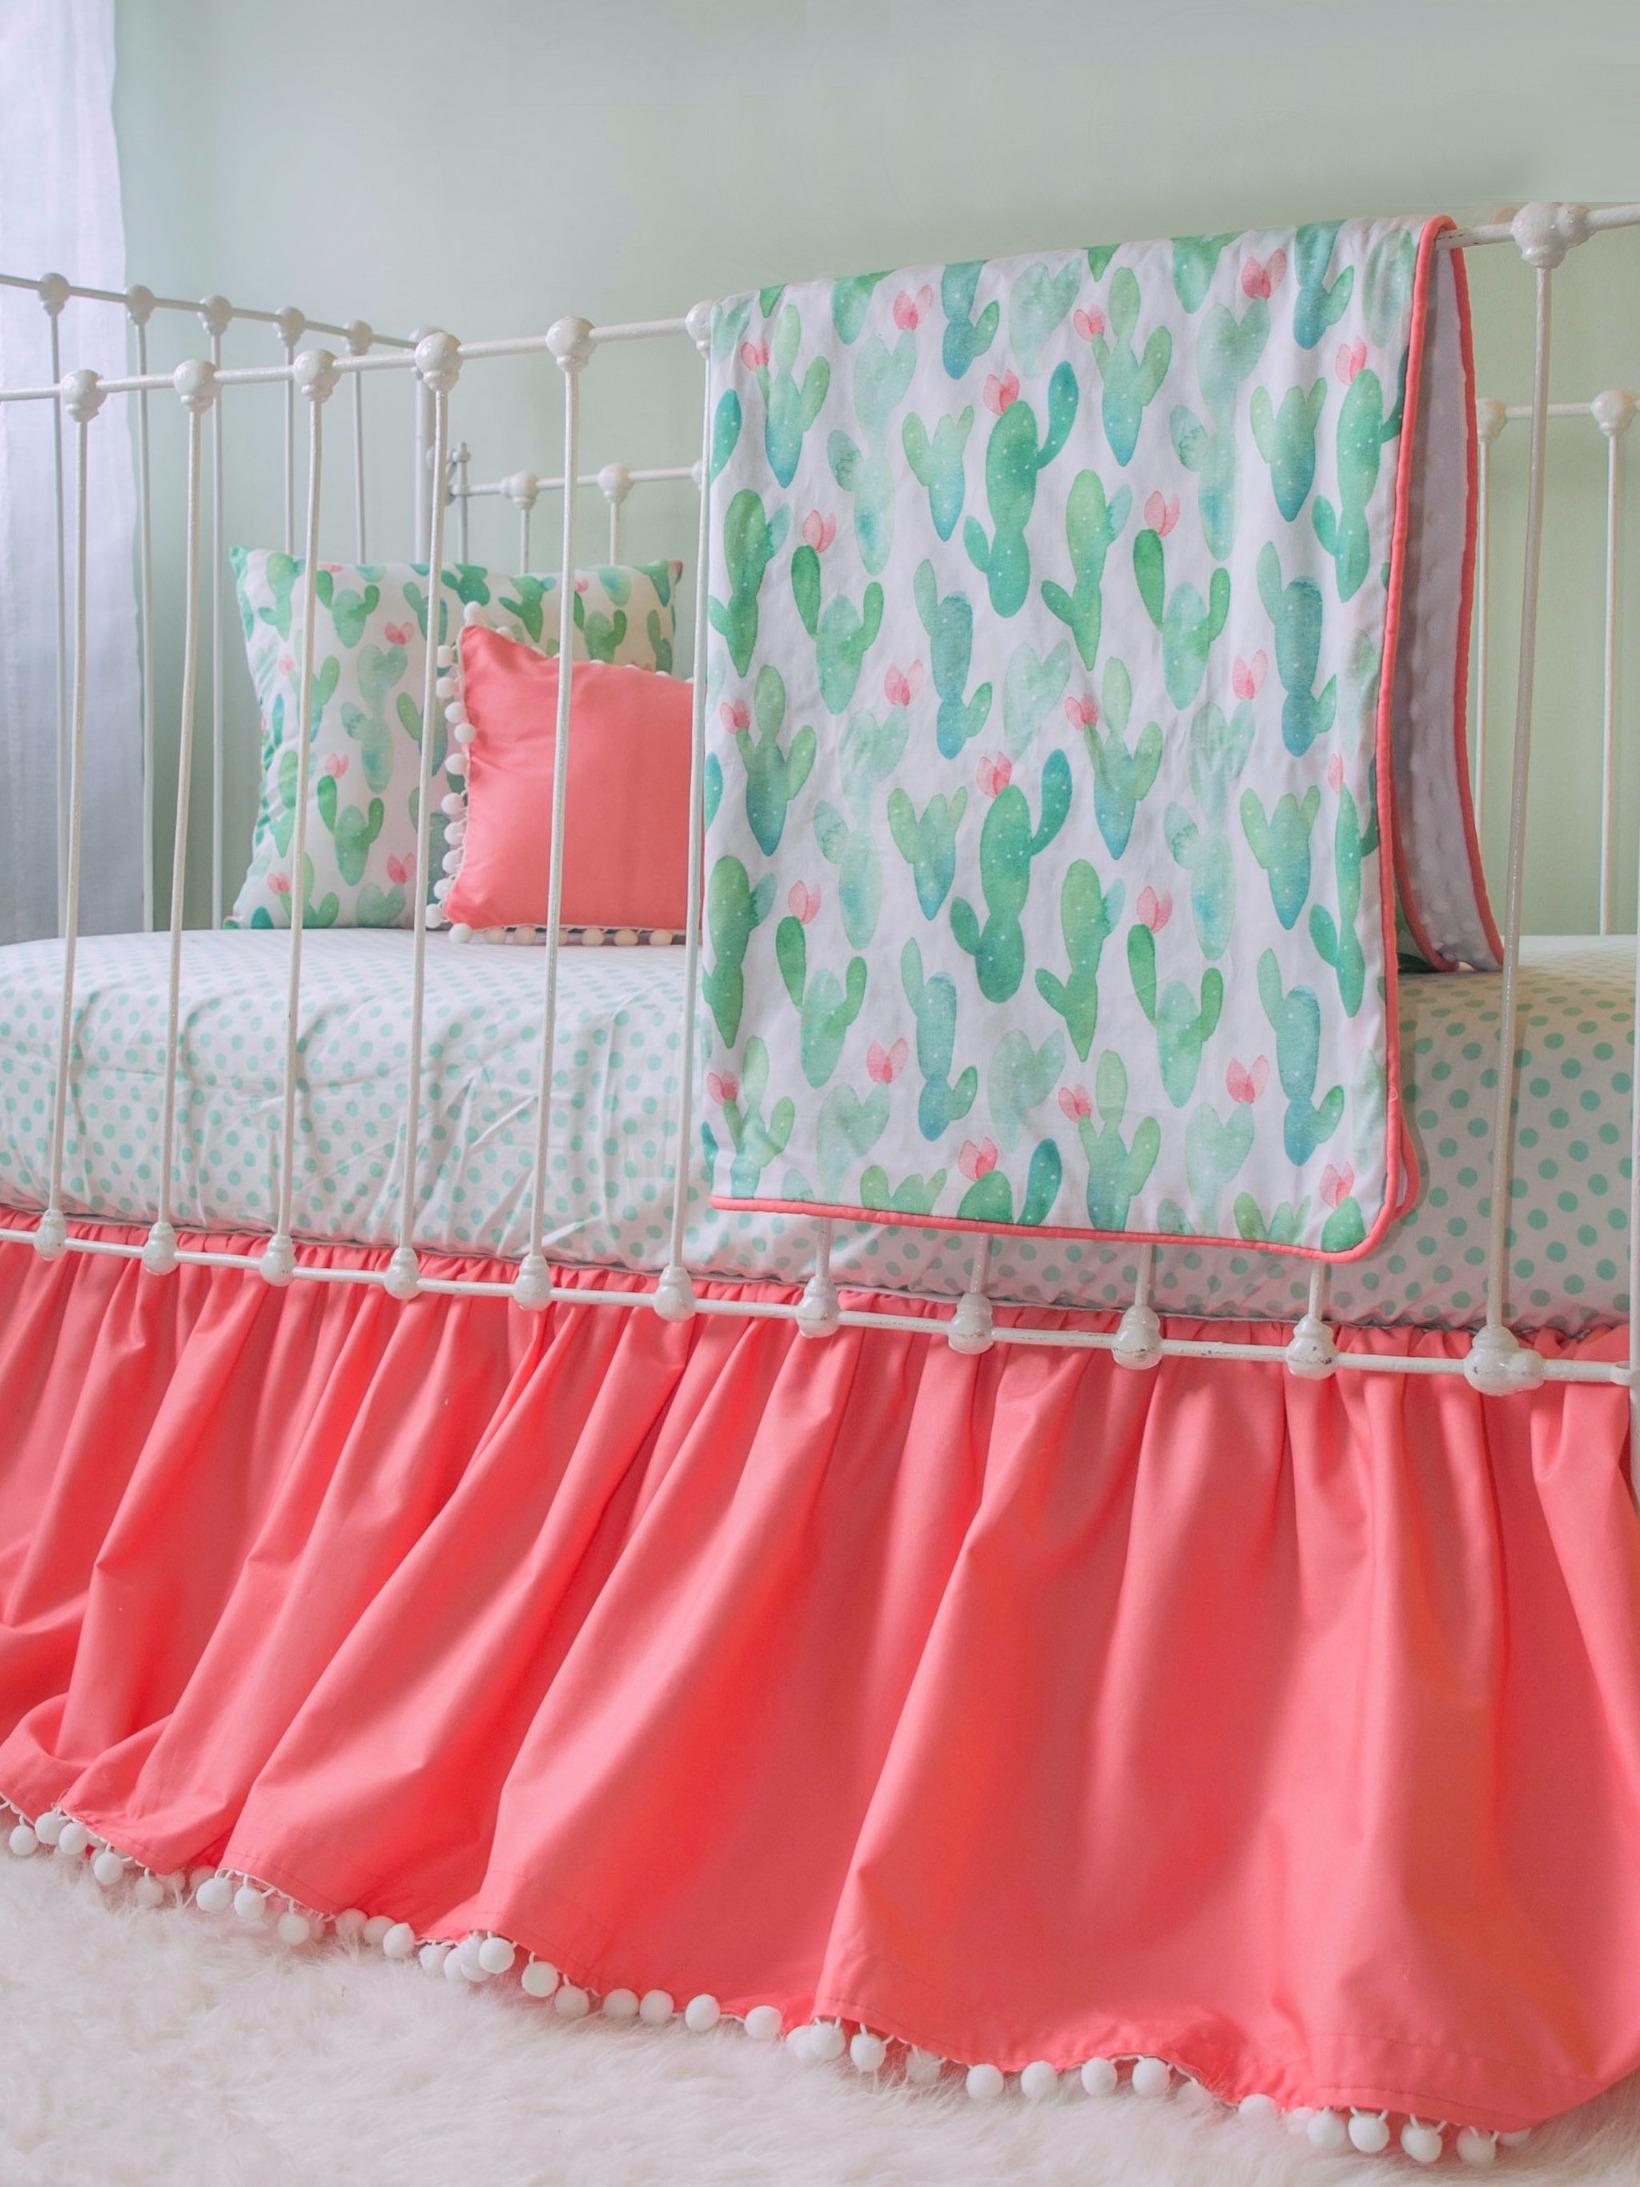 Cactus Blossoms Throw Pillows  Lottie Da Baby